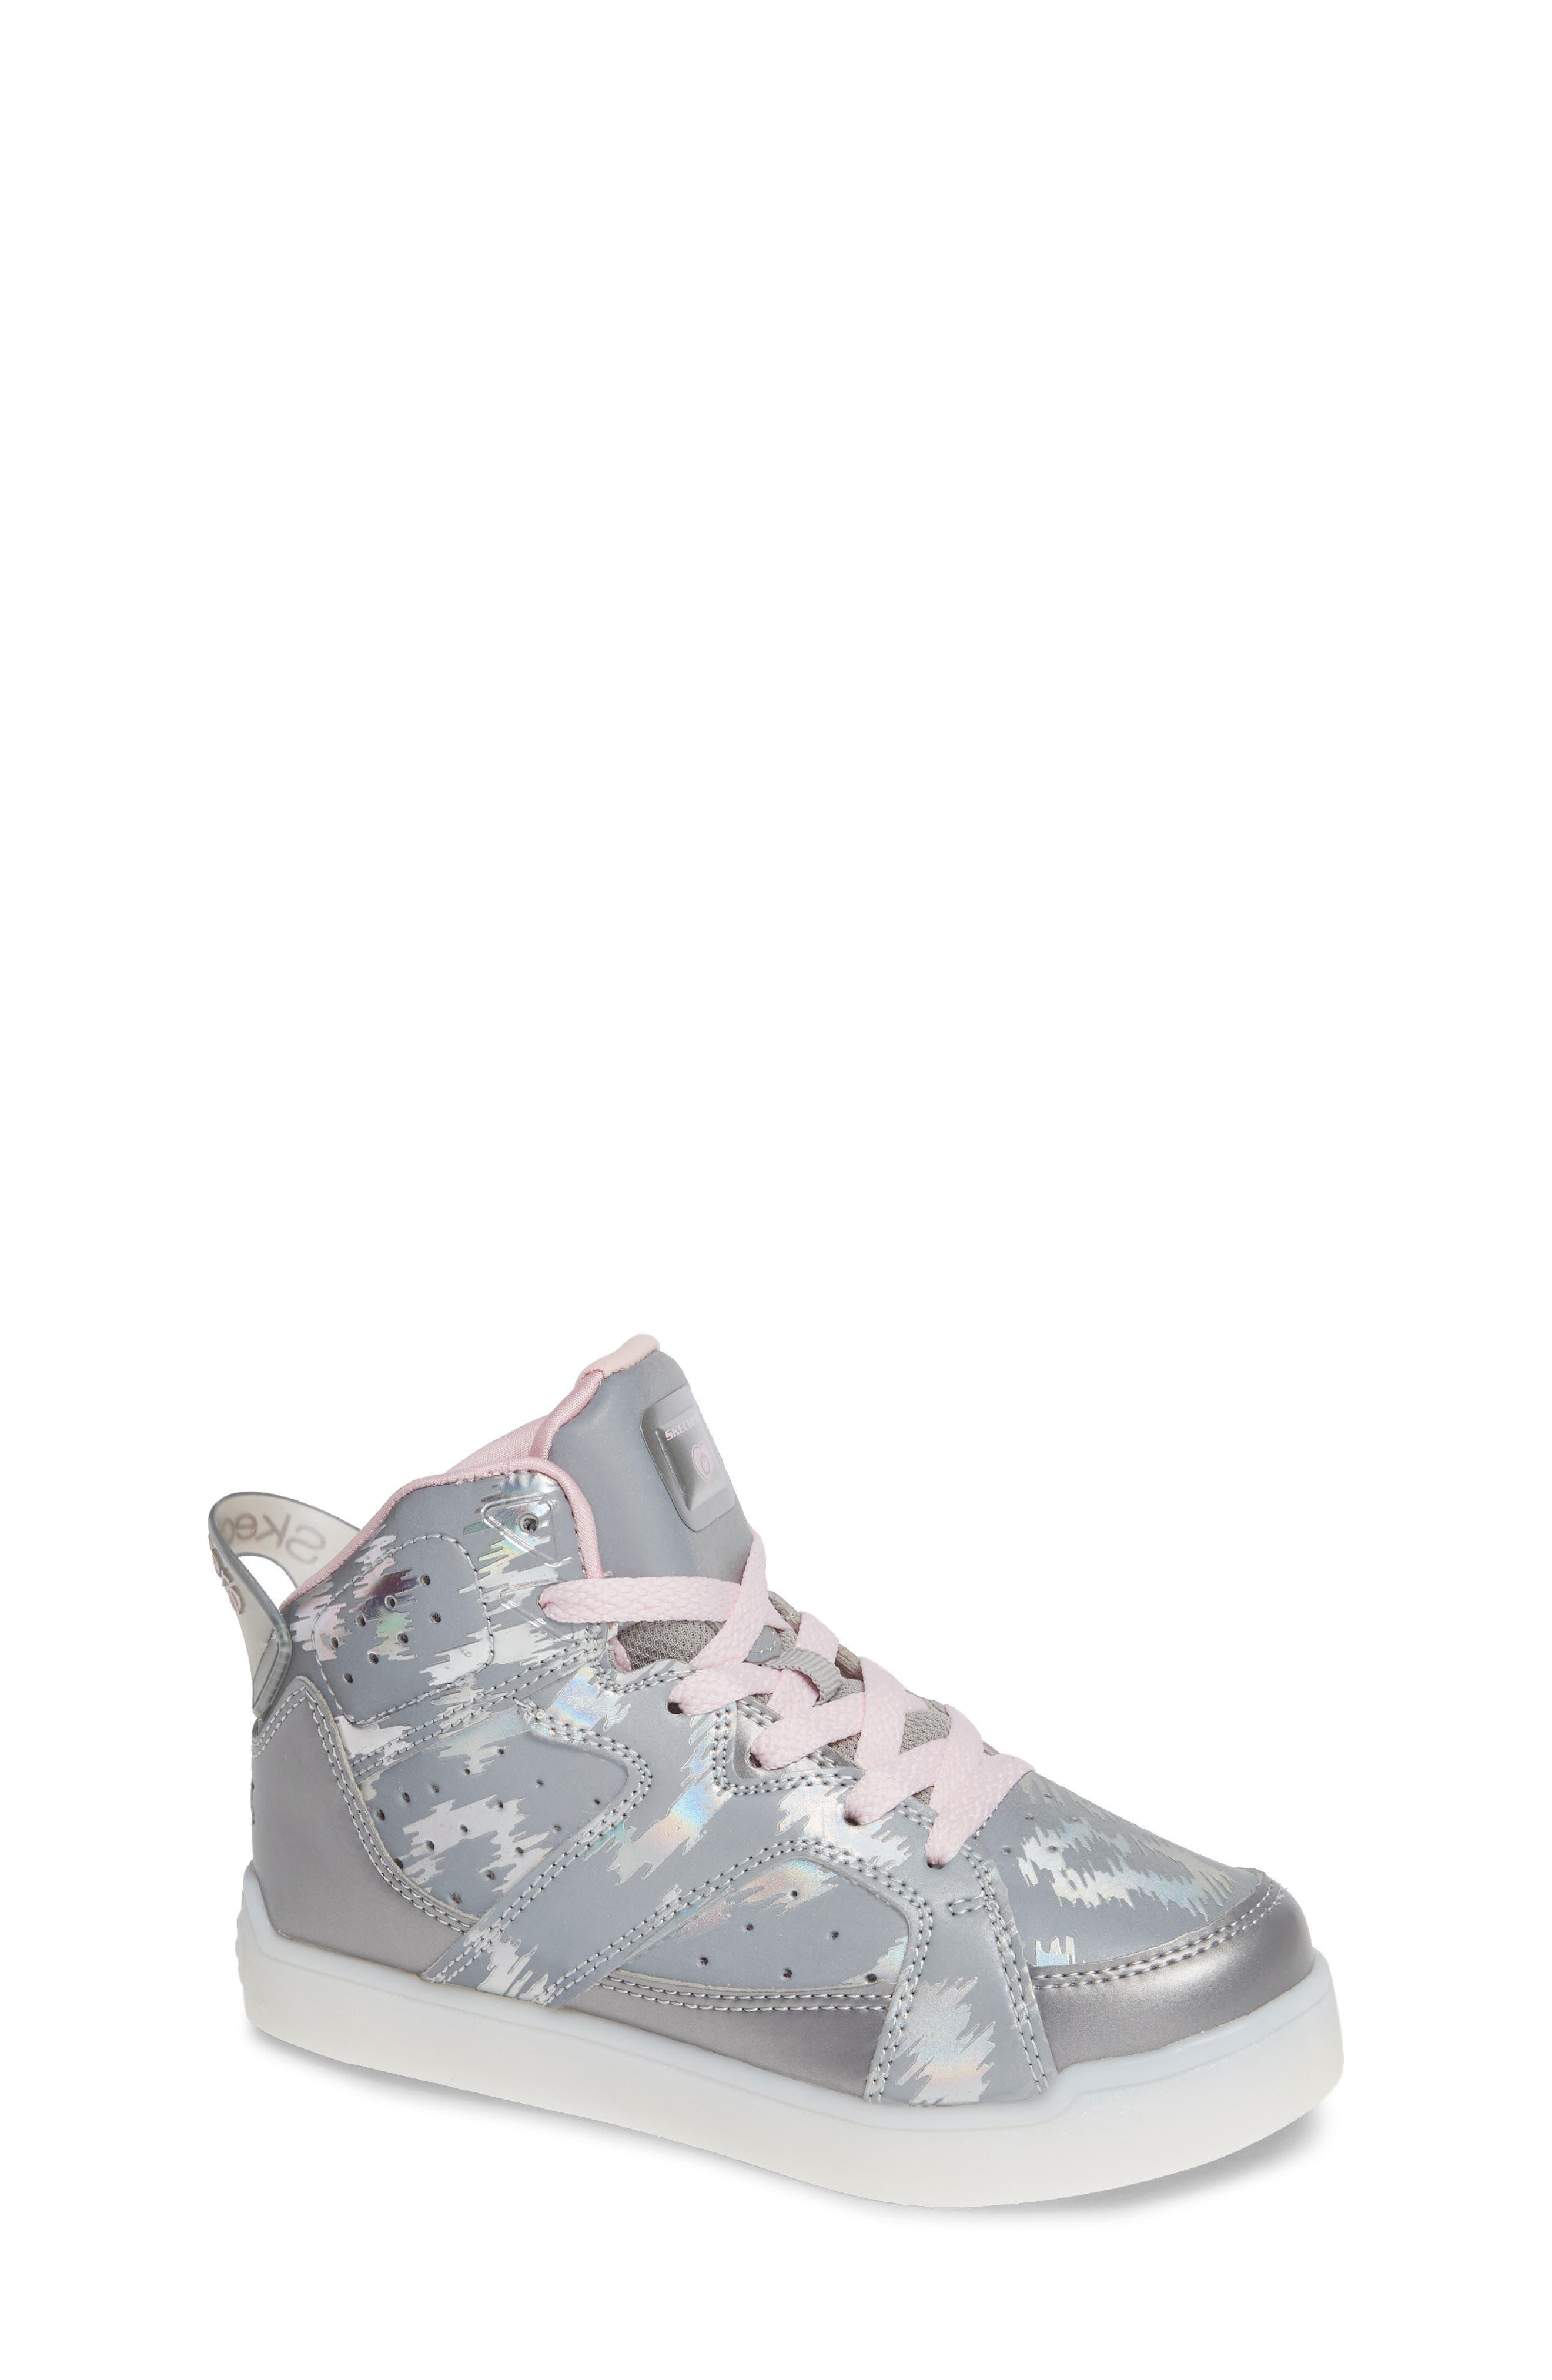 SKECHERS Energy Lights Pro Reflecti-Fab Sneaker, Main, color, 040